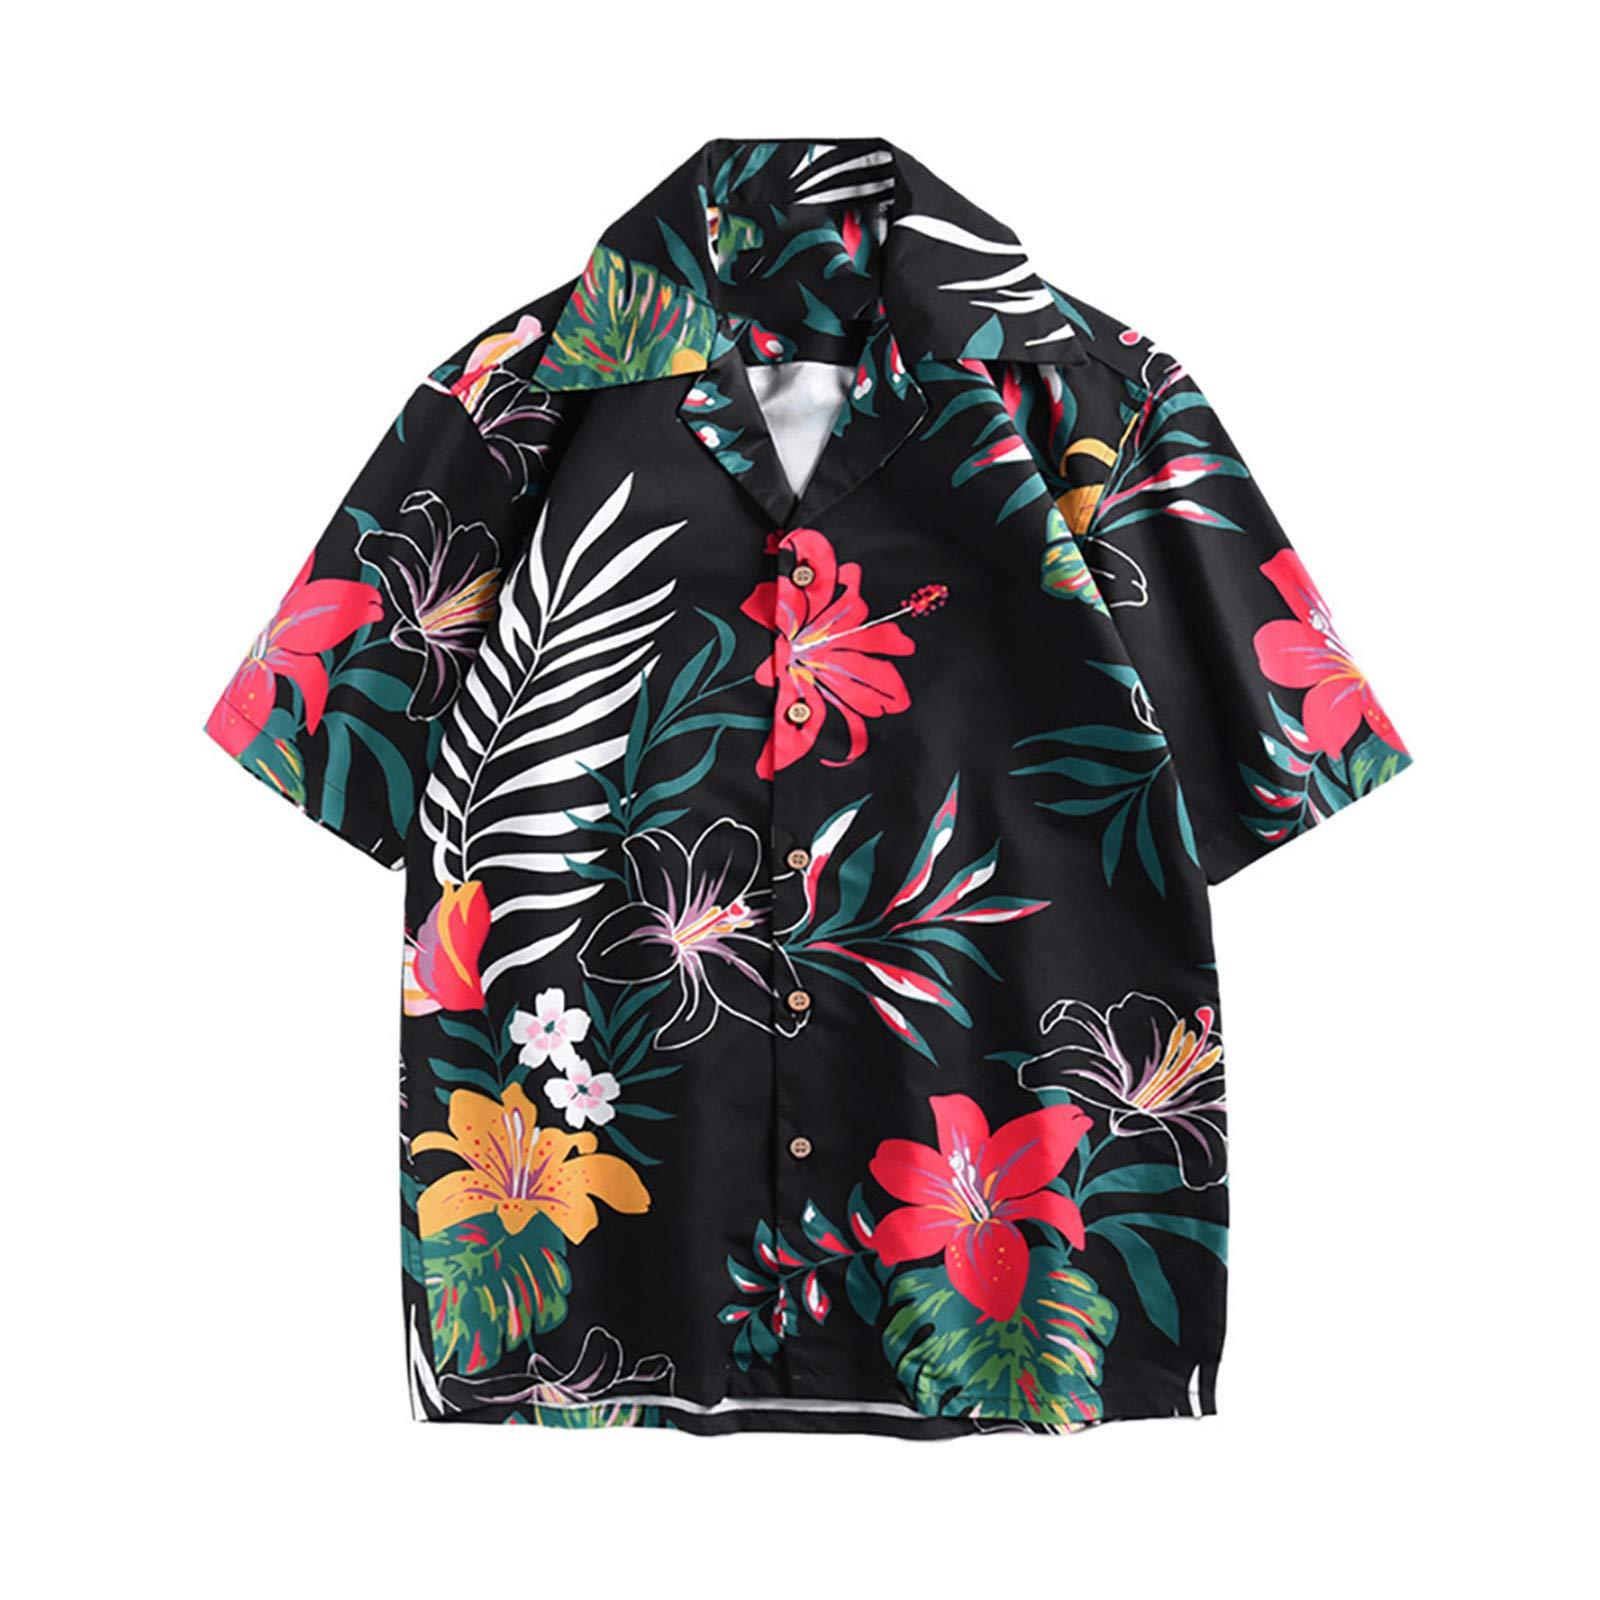 BAOHOKE Mens Summer Short Sleeve Fashion Beachwear T Shirt Printed Casual Tees (Green,L)